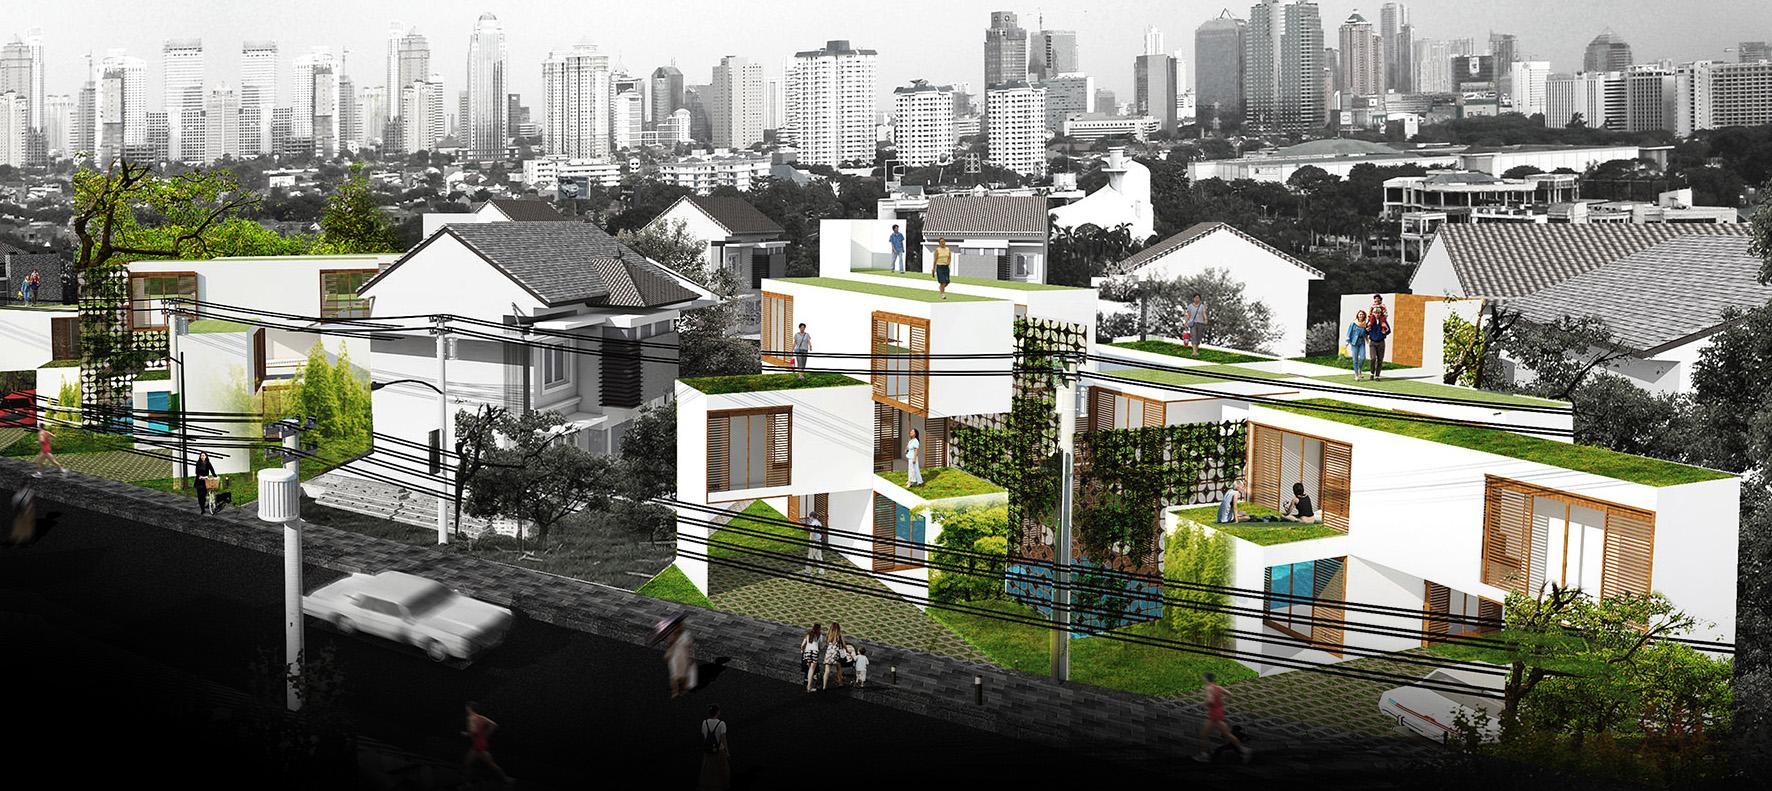 Green Modular Housing Sytem